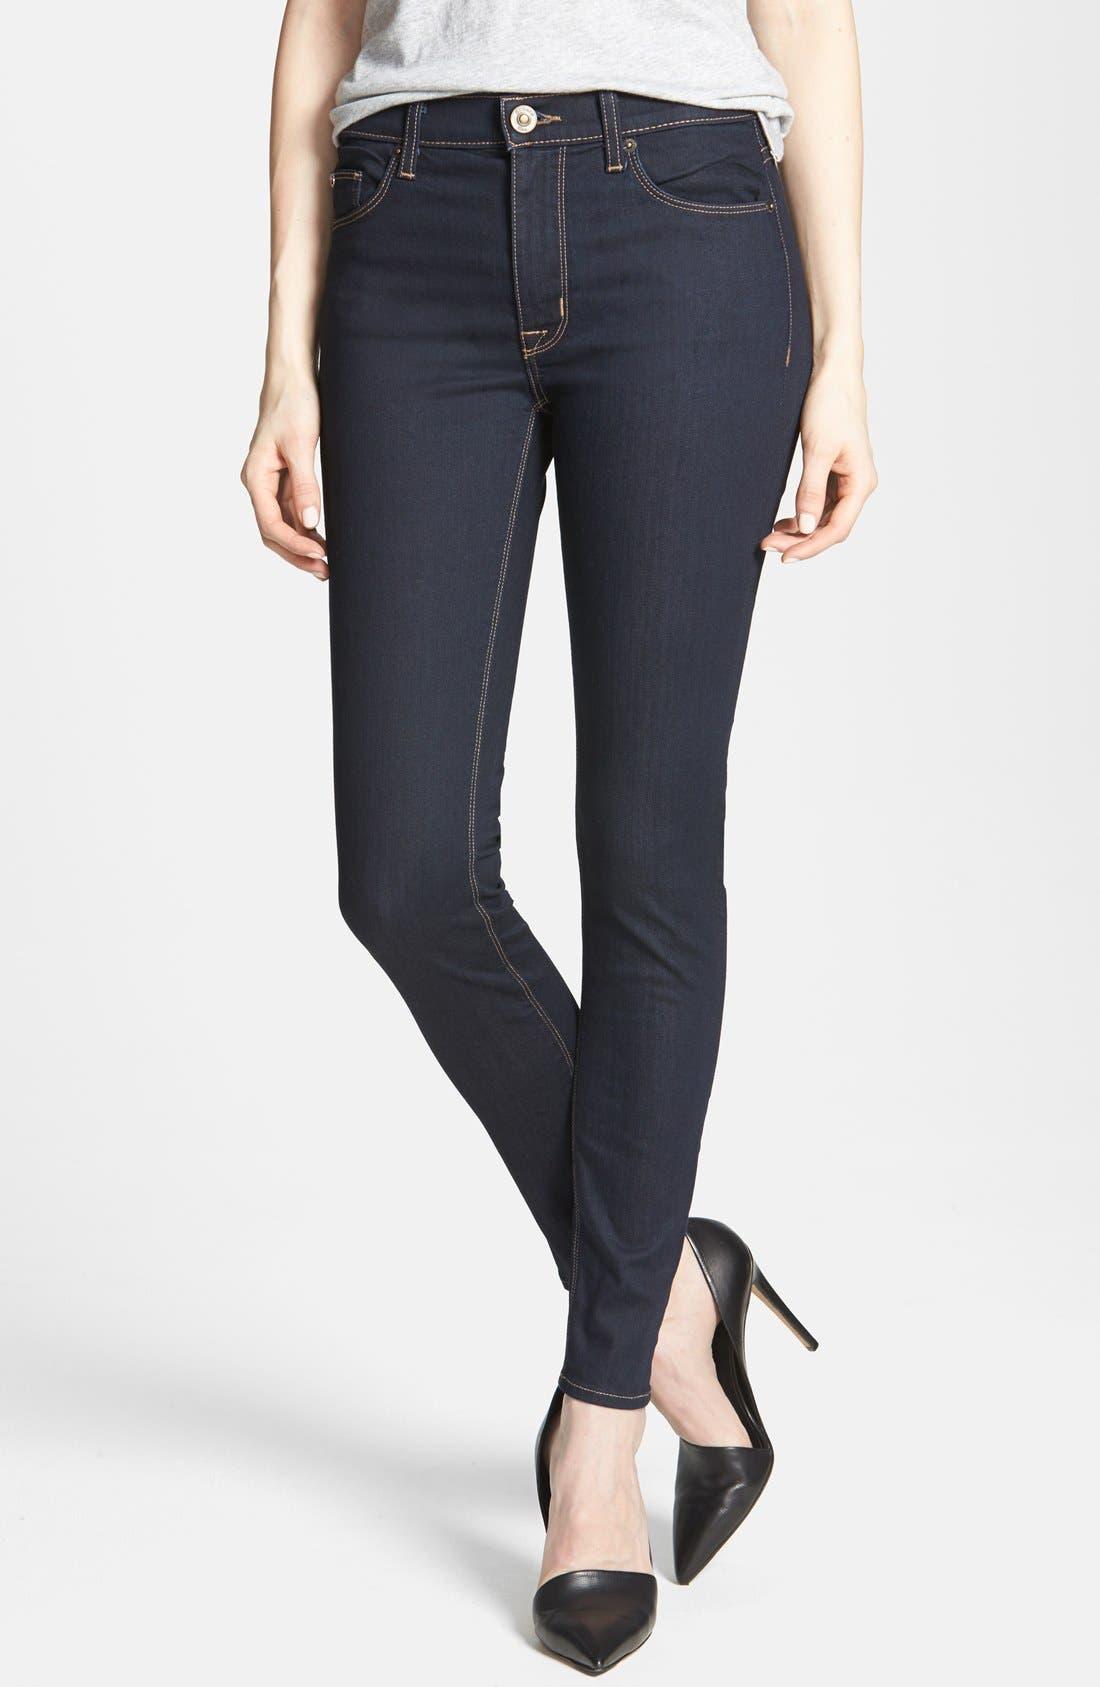 Main Image - Hudson Jeans 'Barbara' High Rise Skinny Jeans (Storm)